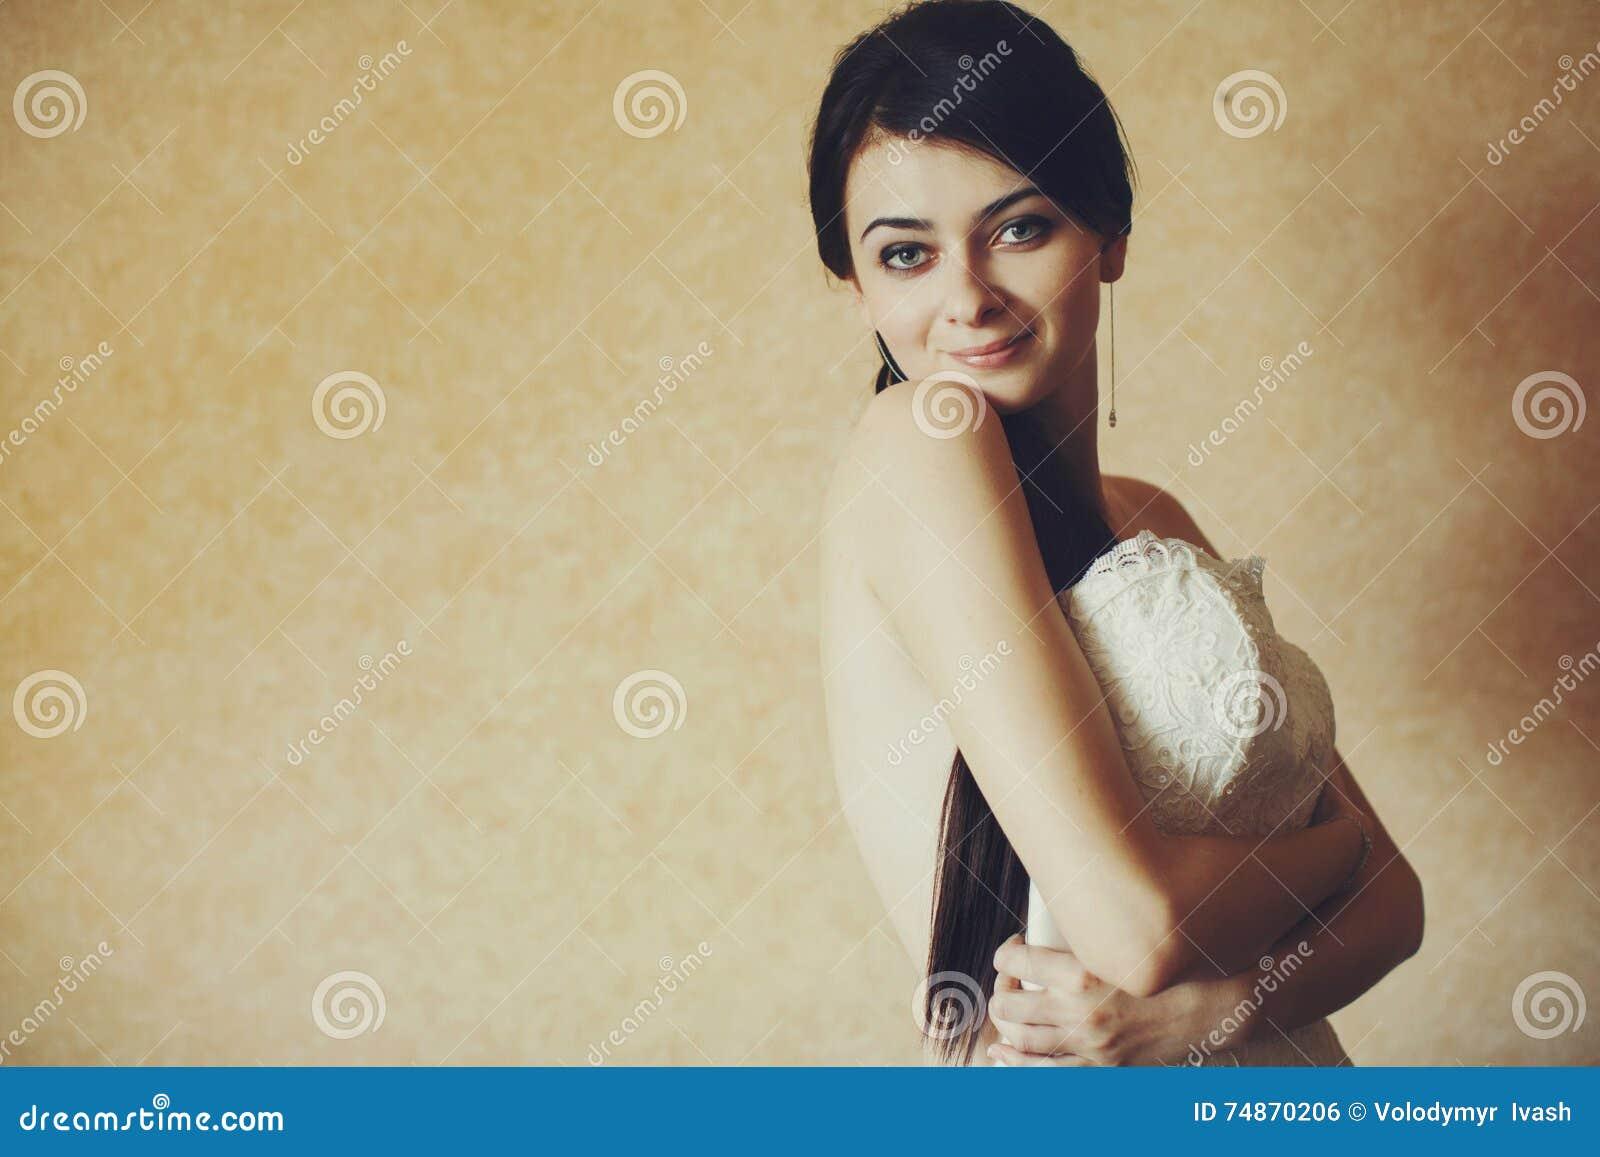 Teen mallu college girls nude photos